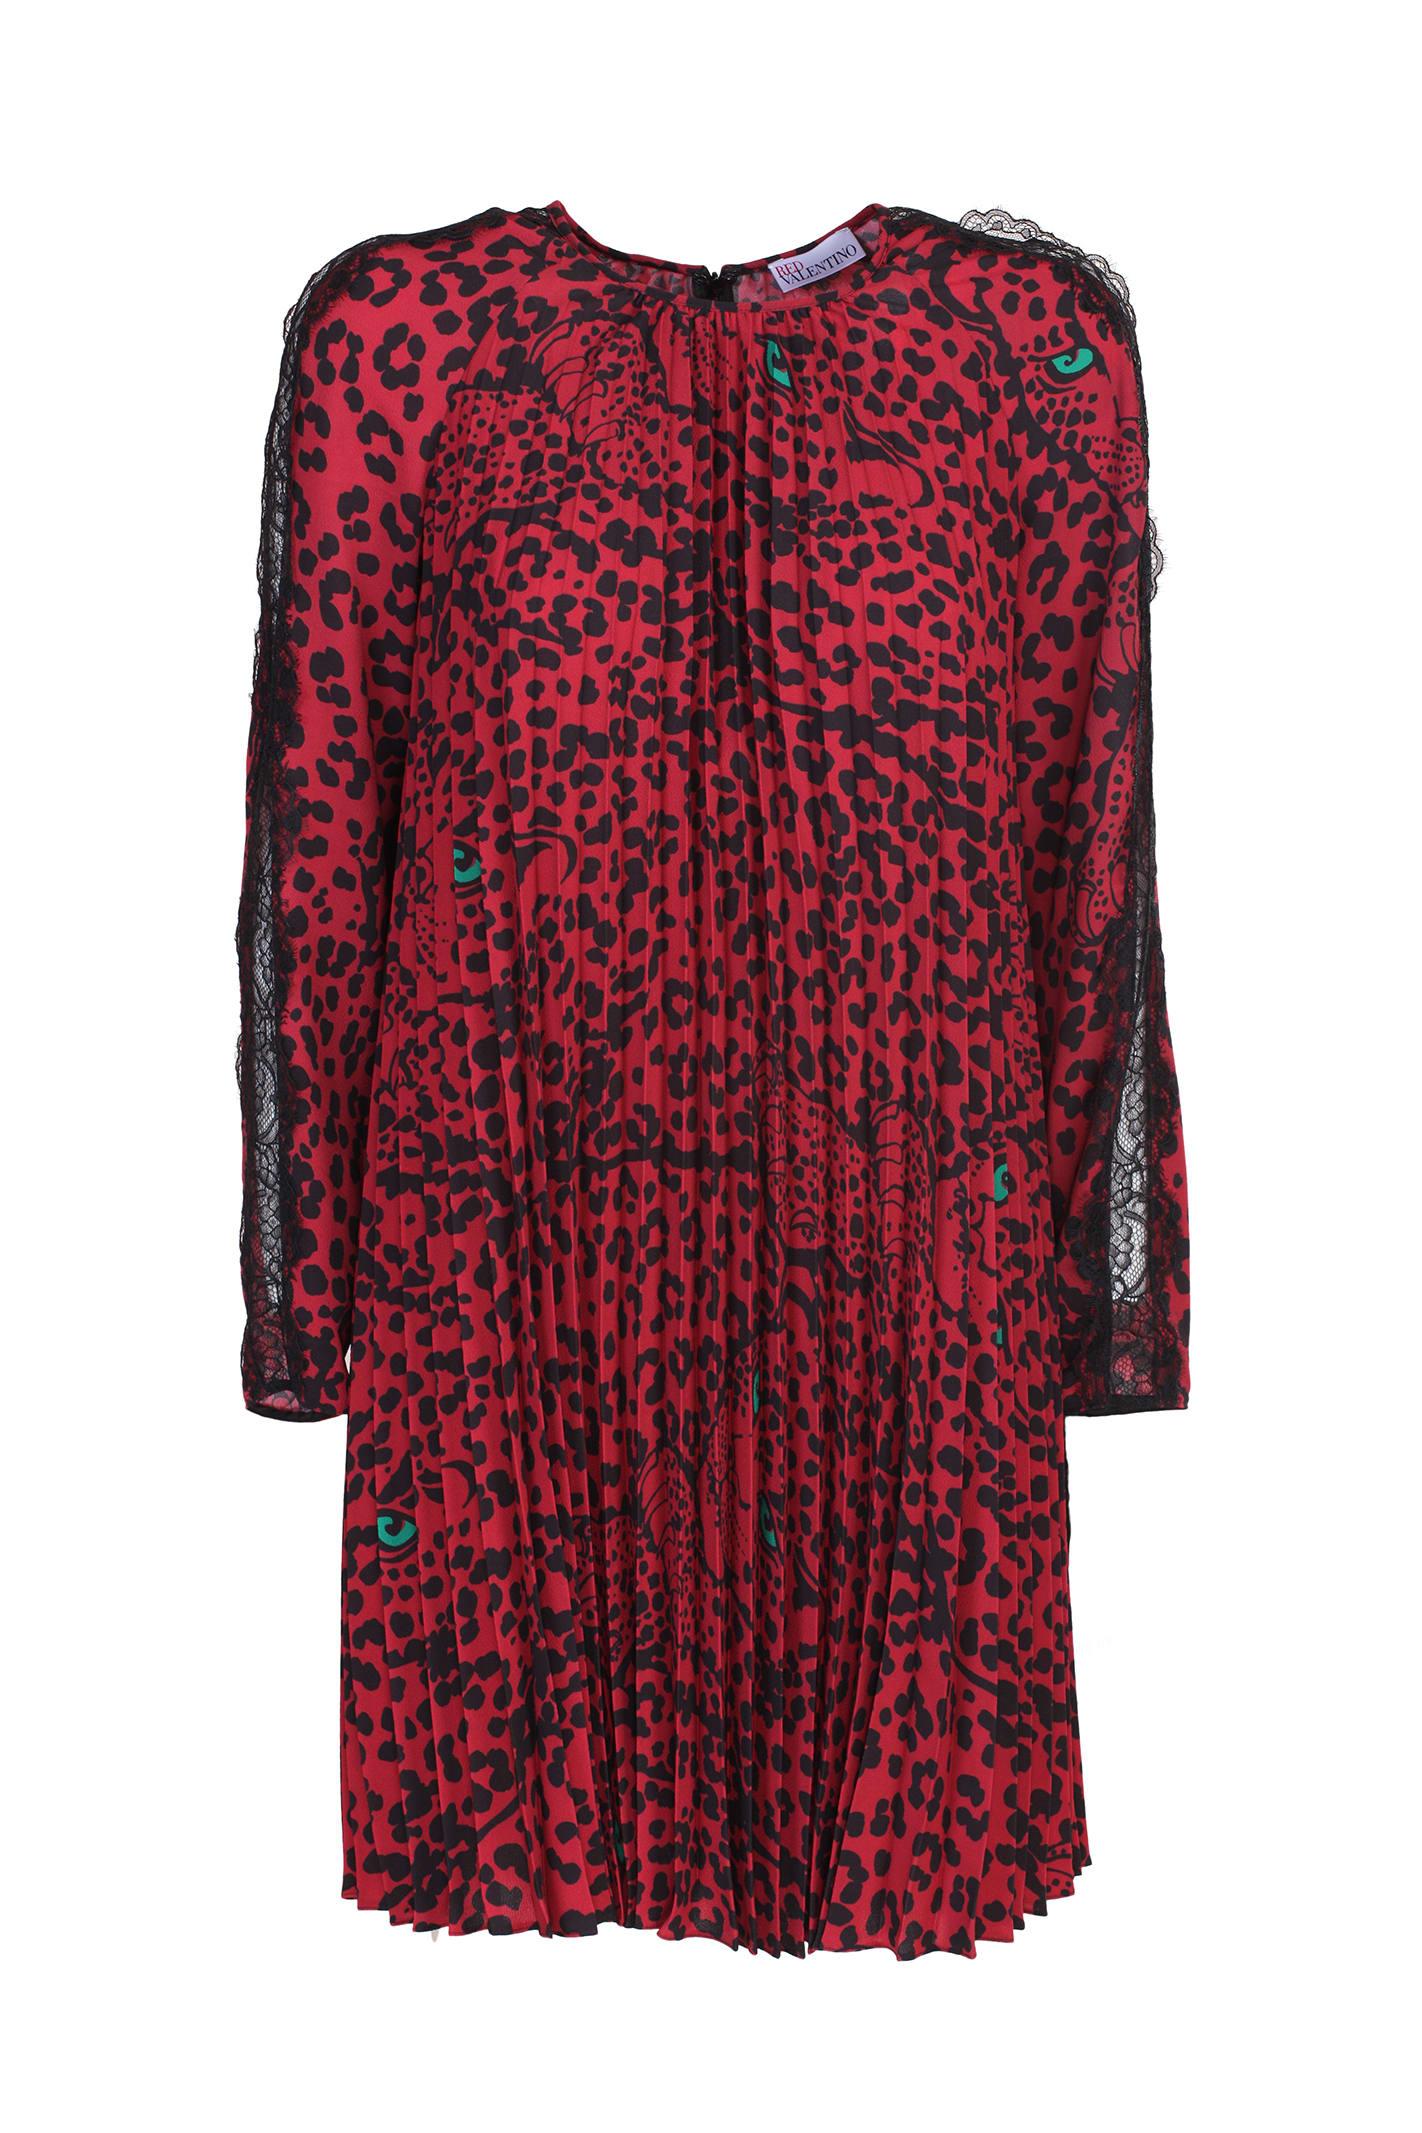 Red Valentino pleated dress